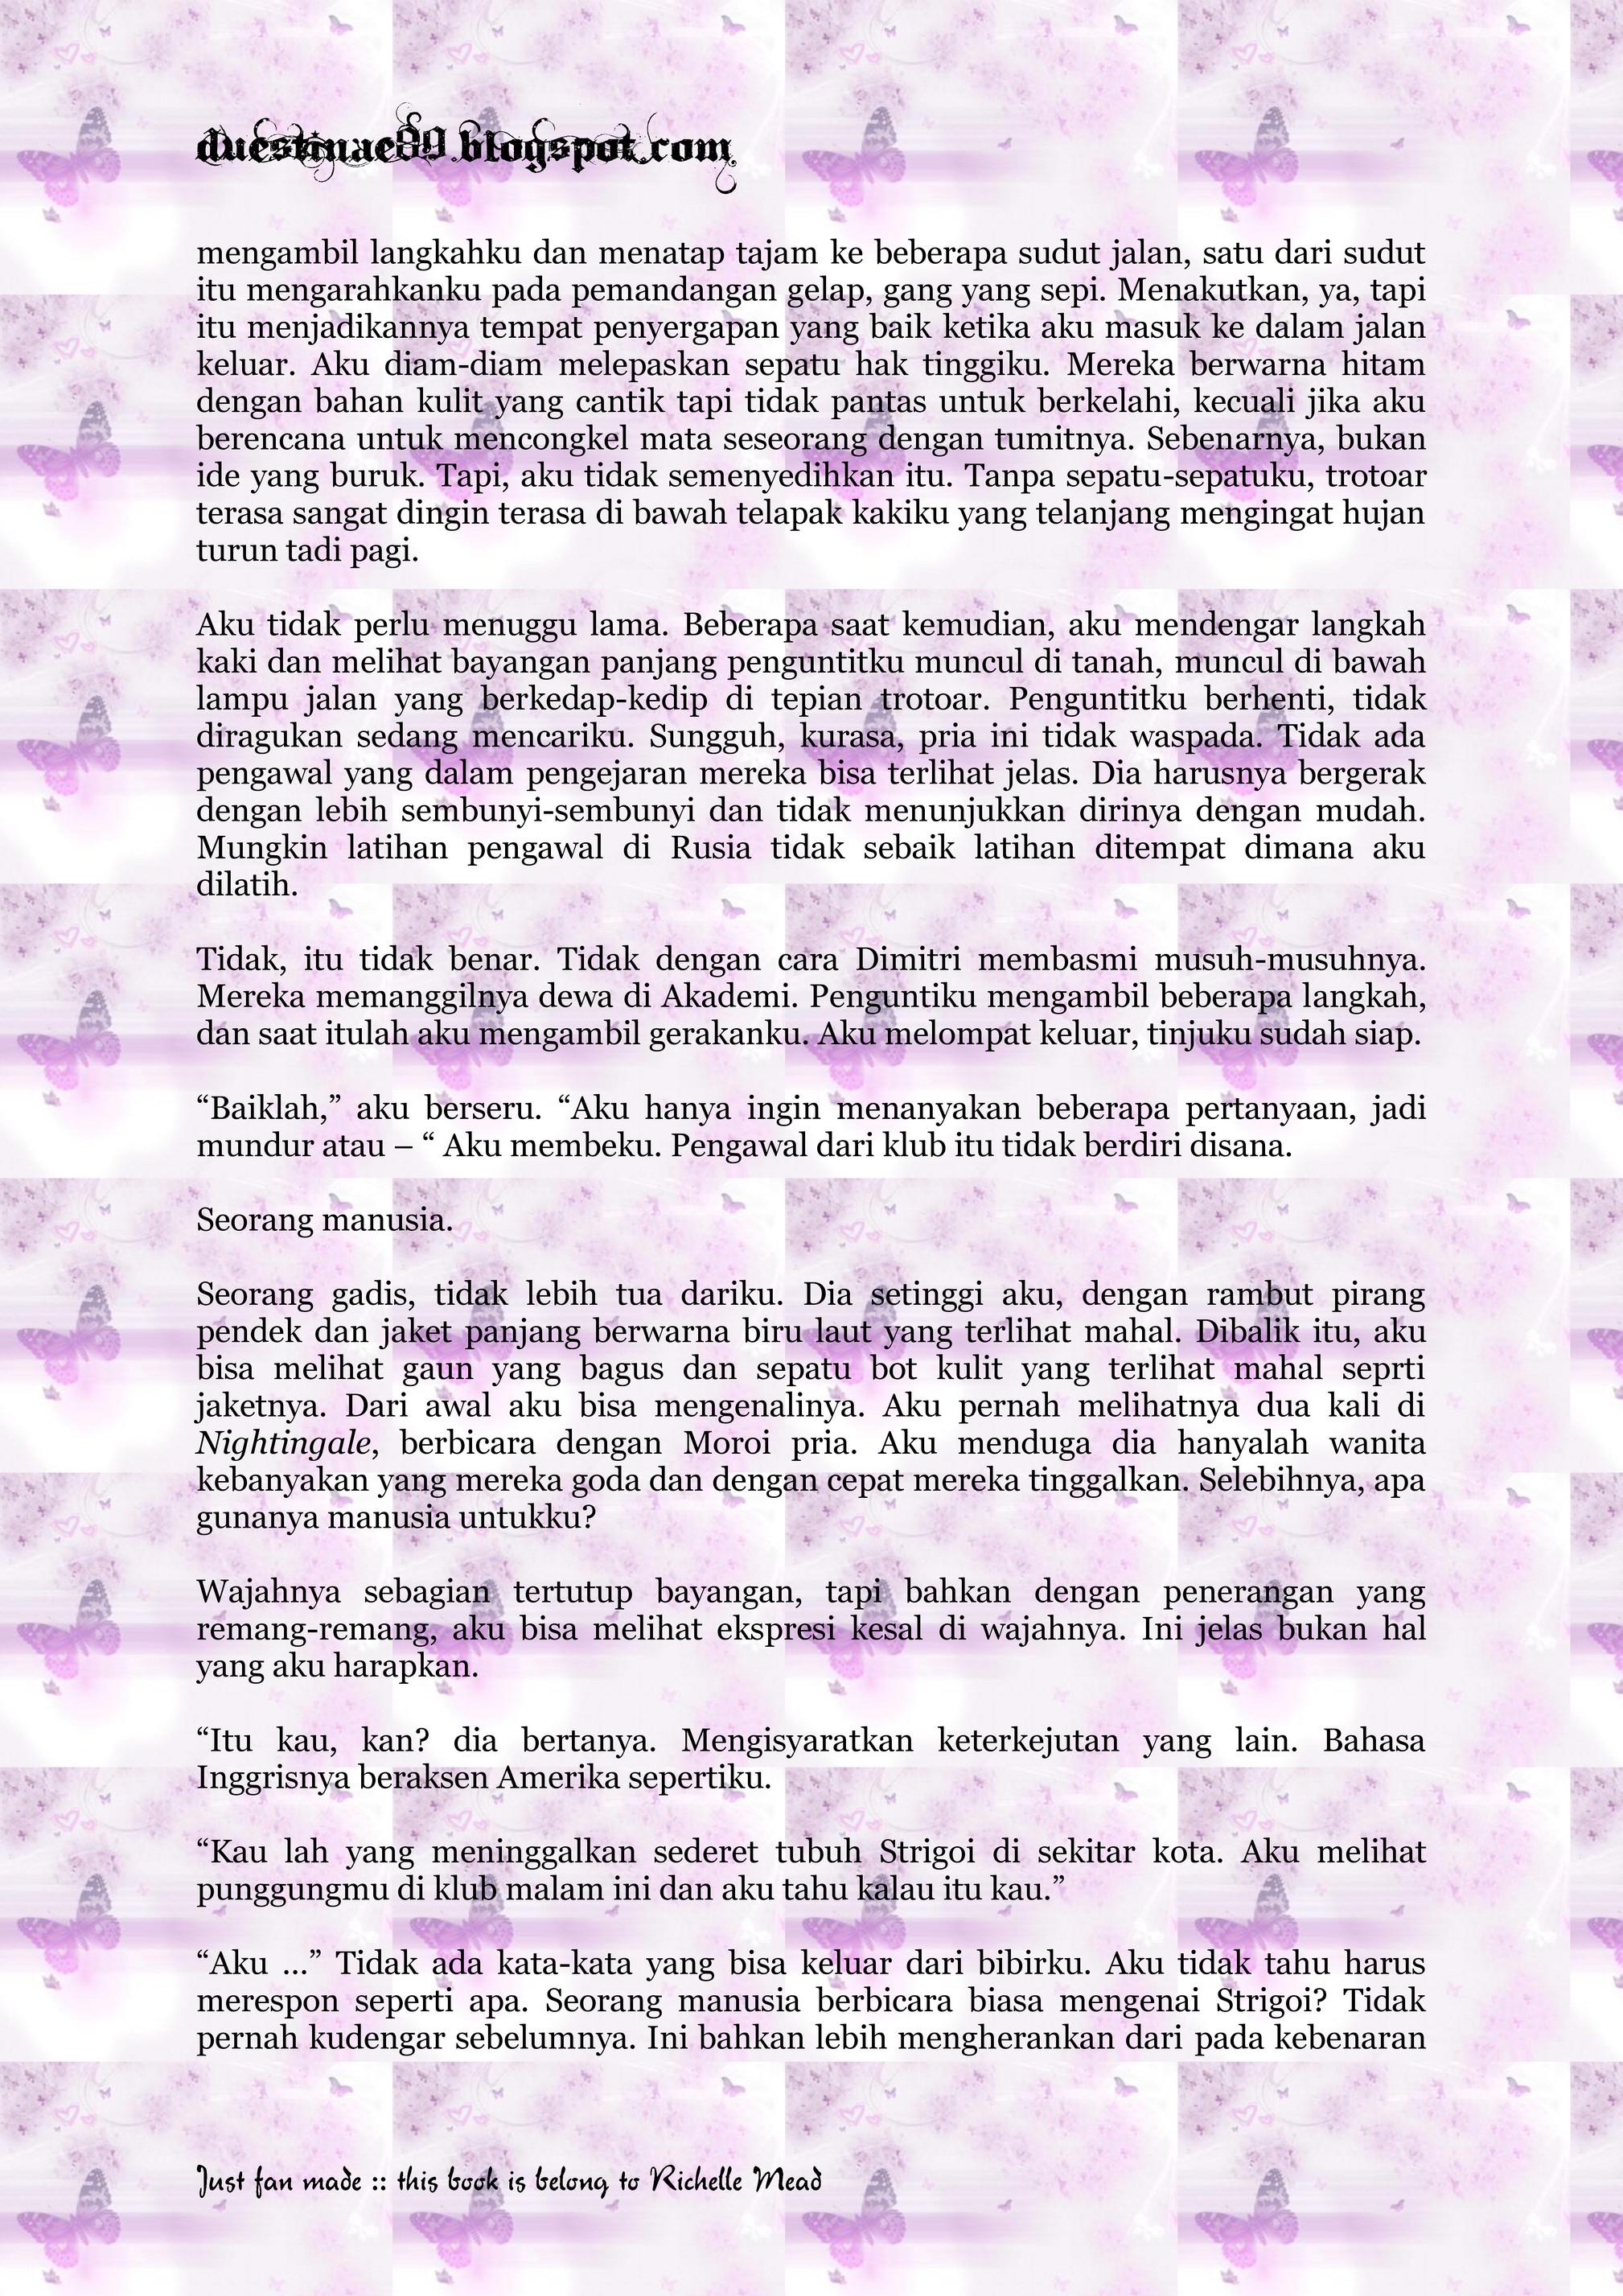 Bnovel Blood Promise Bahasa Indonesia Puslapis 1 Created With Publitas Com